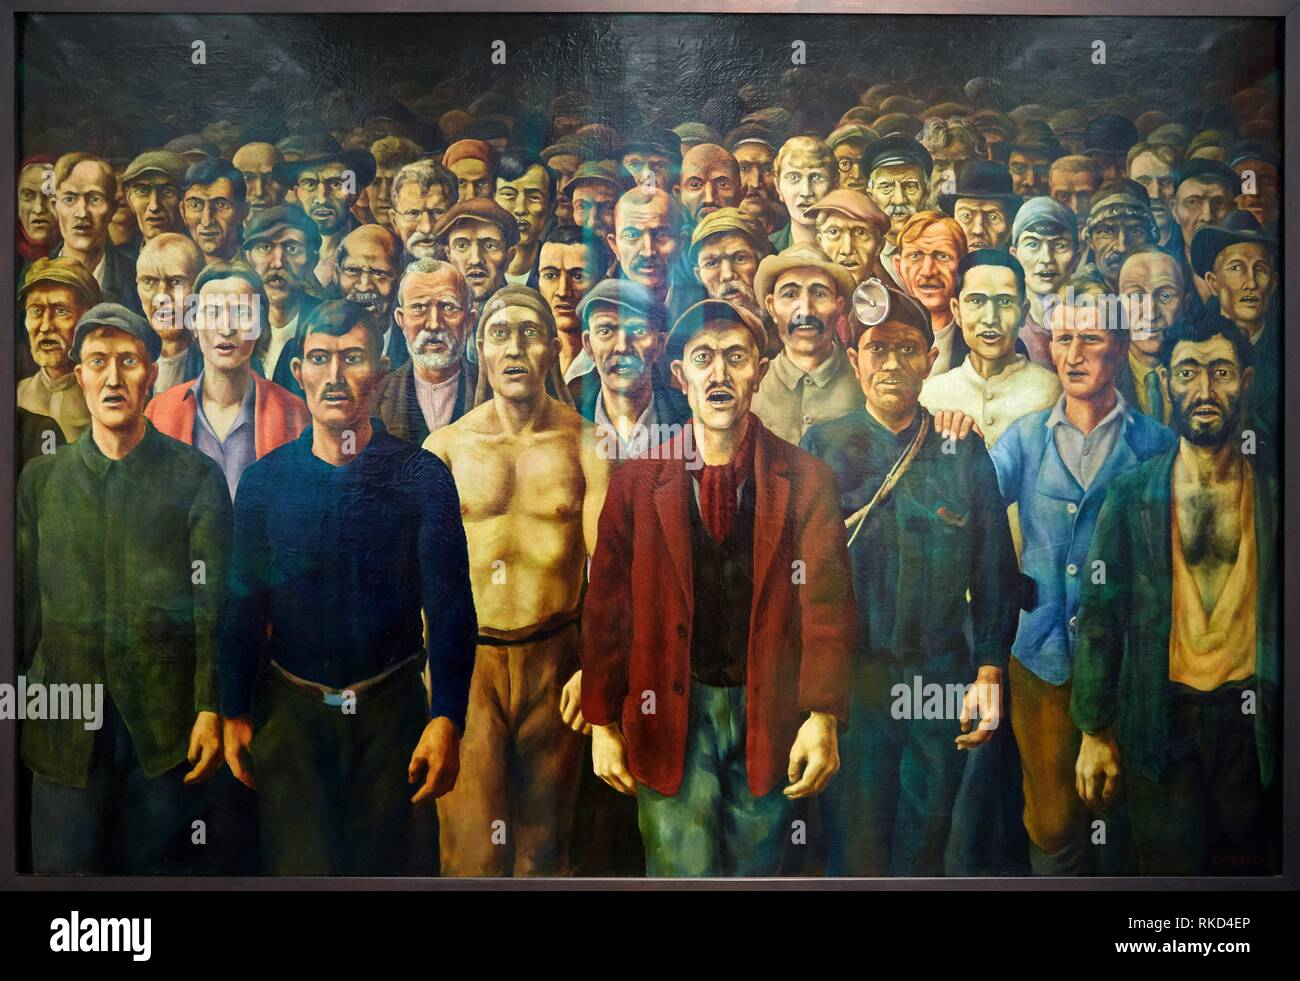 '''The International'', Otto Giebel, 1929, Deutsches Historisches Museum, Berlin, Germany - Stock Image